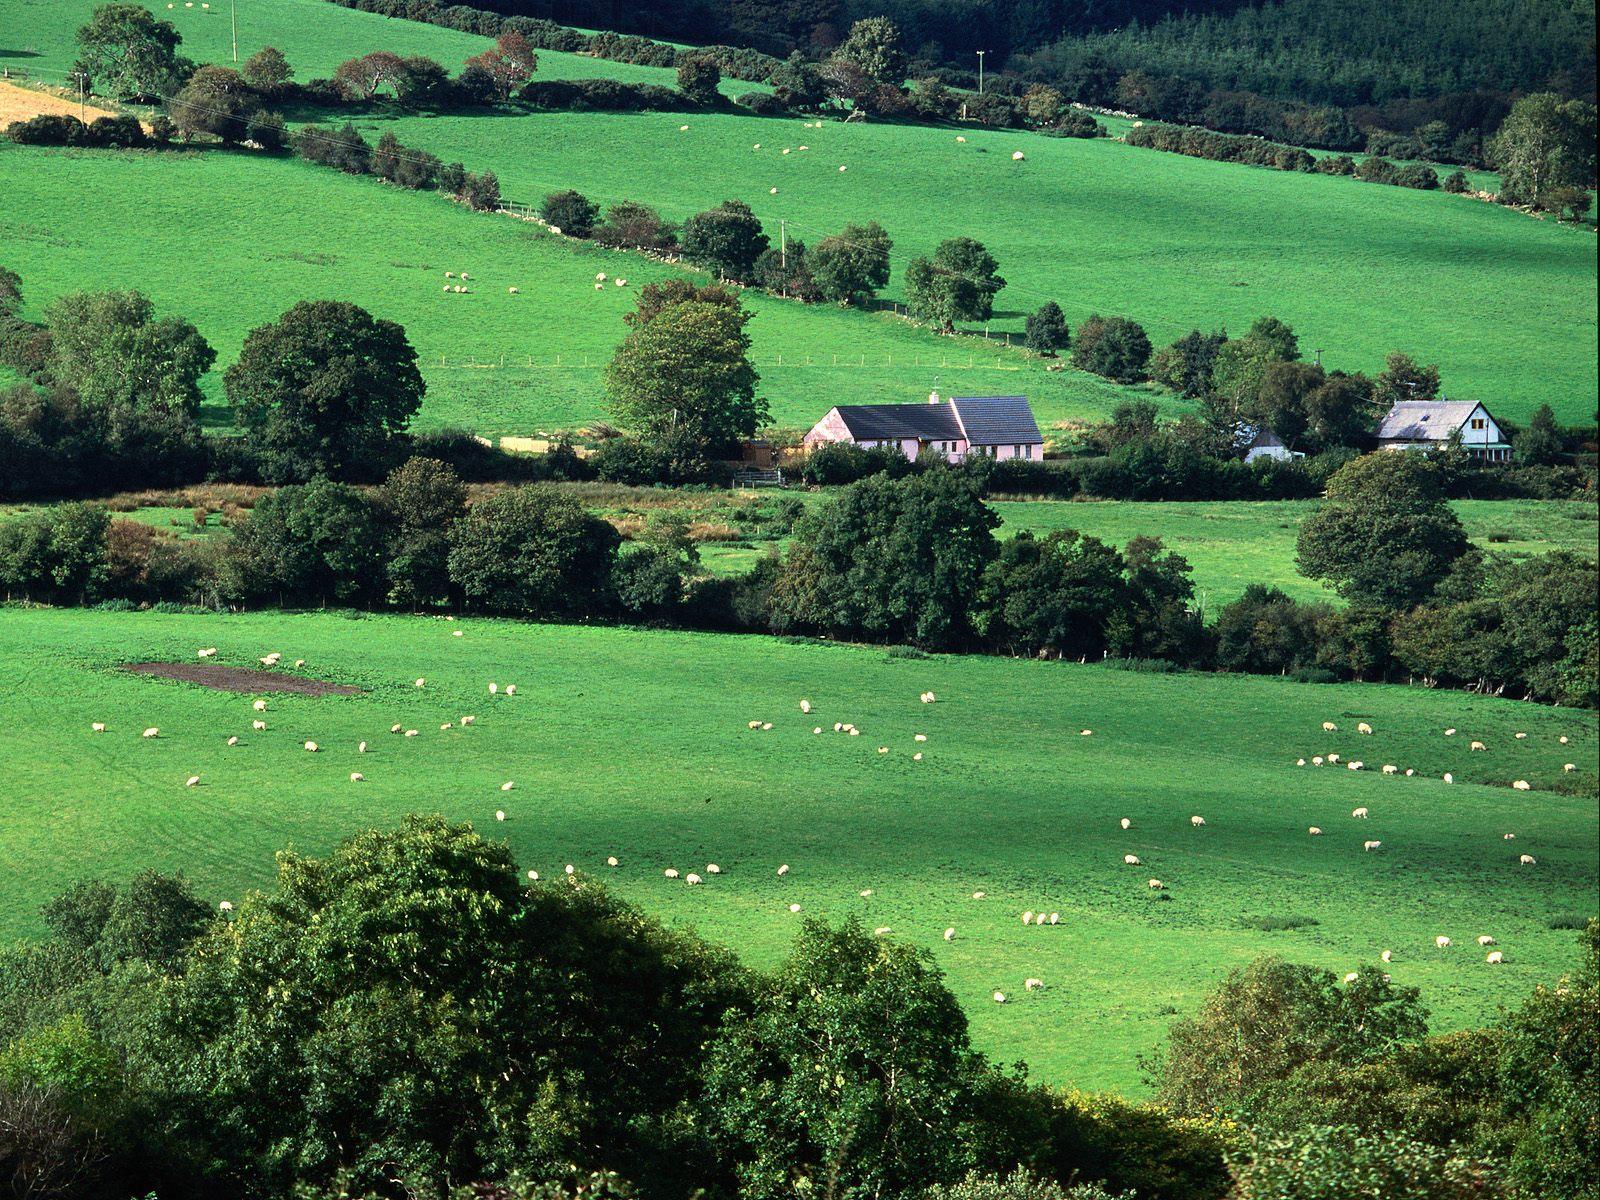 http://3.bp.blogspot.com/-xkGmW9hTNDU/TlTD238DVtI/AAAAAAAABRo/qTSBaFl8-p8/s1600/Fields+and+Farmhouses+of+County+Cork%252C+Ireland.jpg